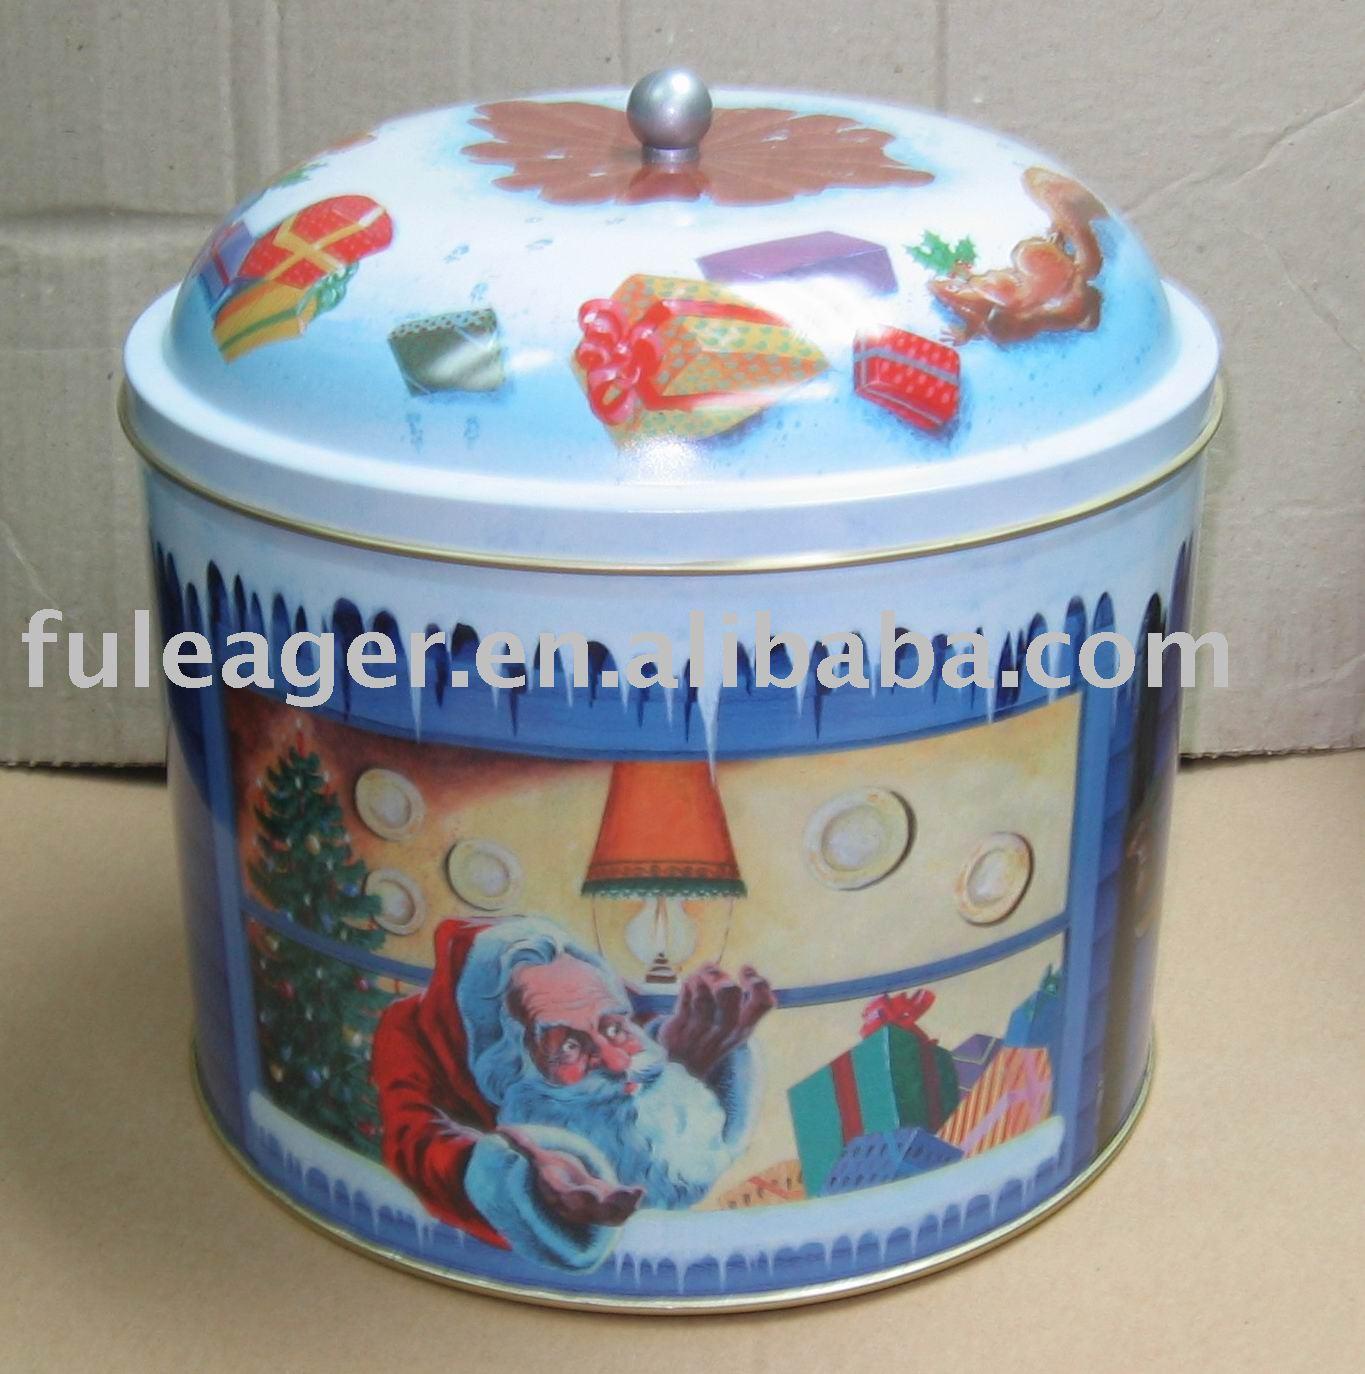 christmas cookie tin boxbiscuit tin case buy tin boxtin cantin case product on alibabacom